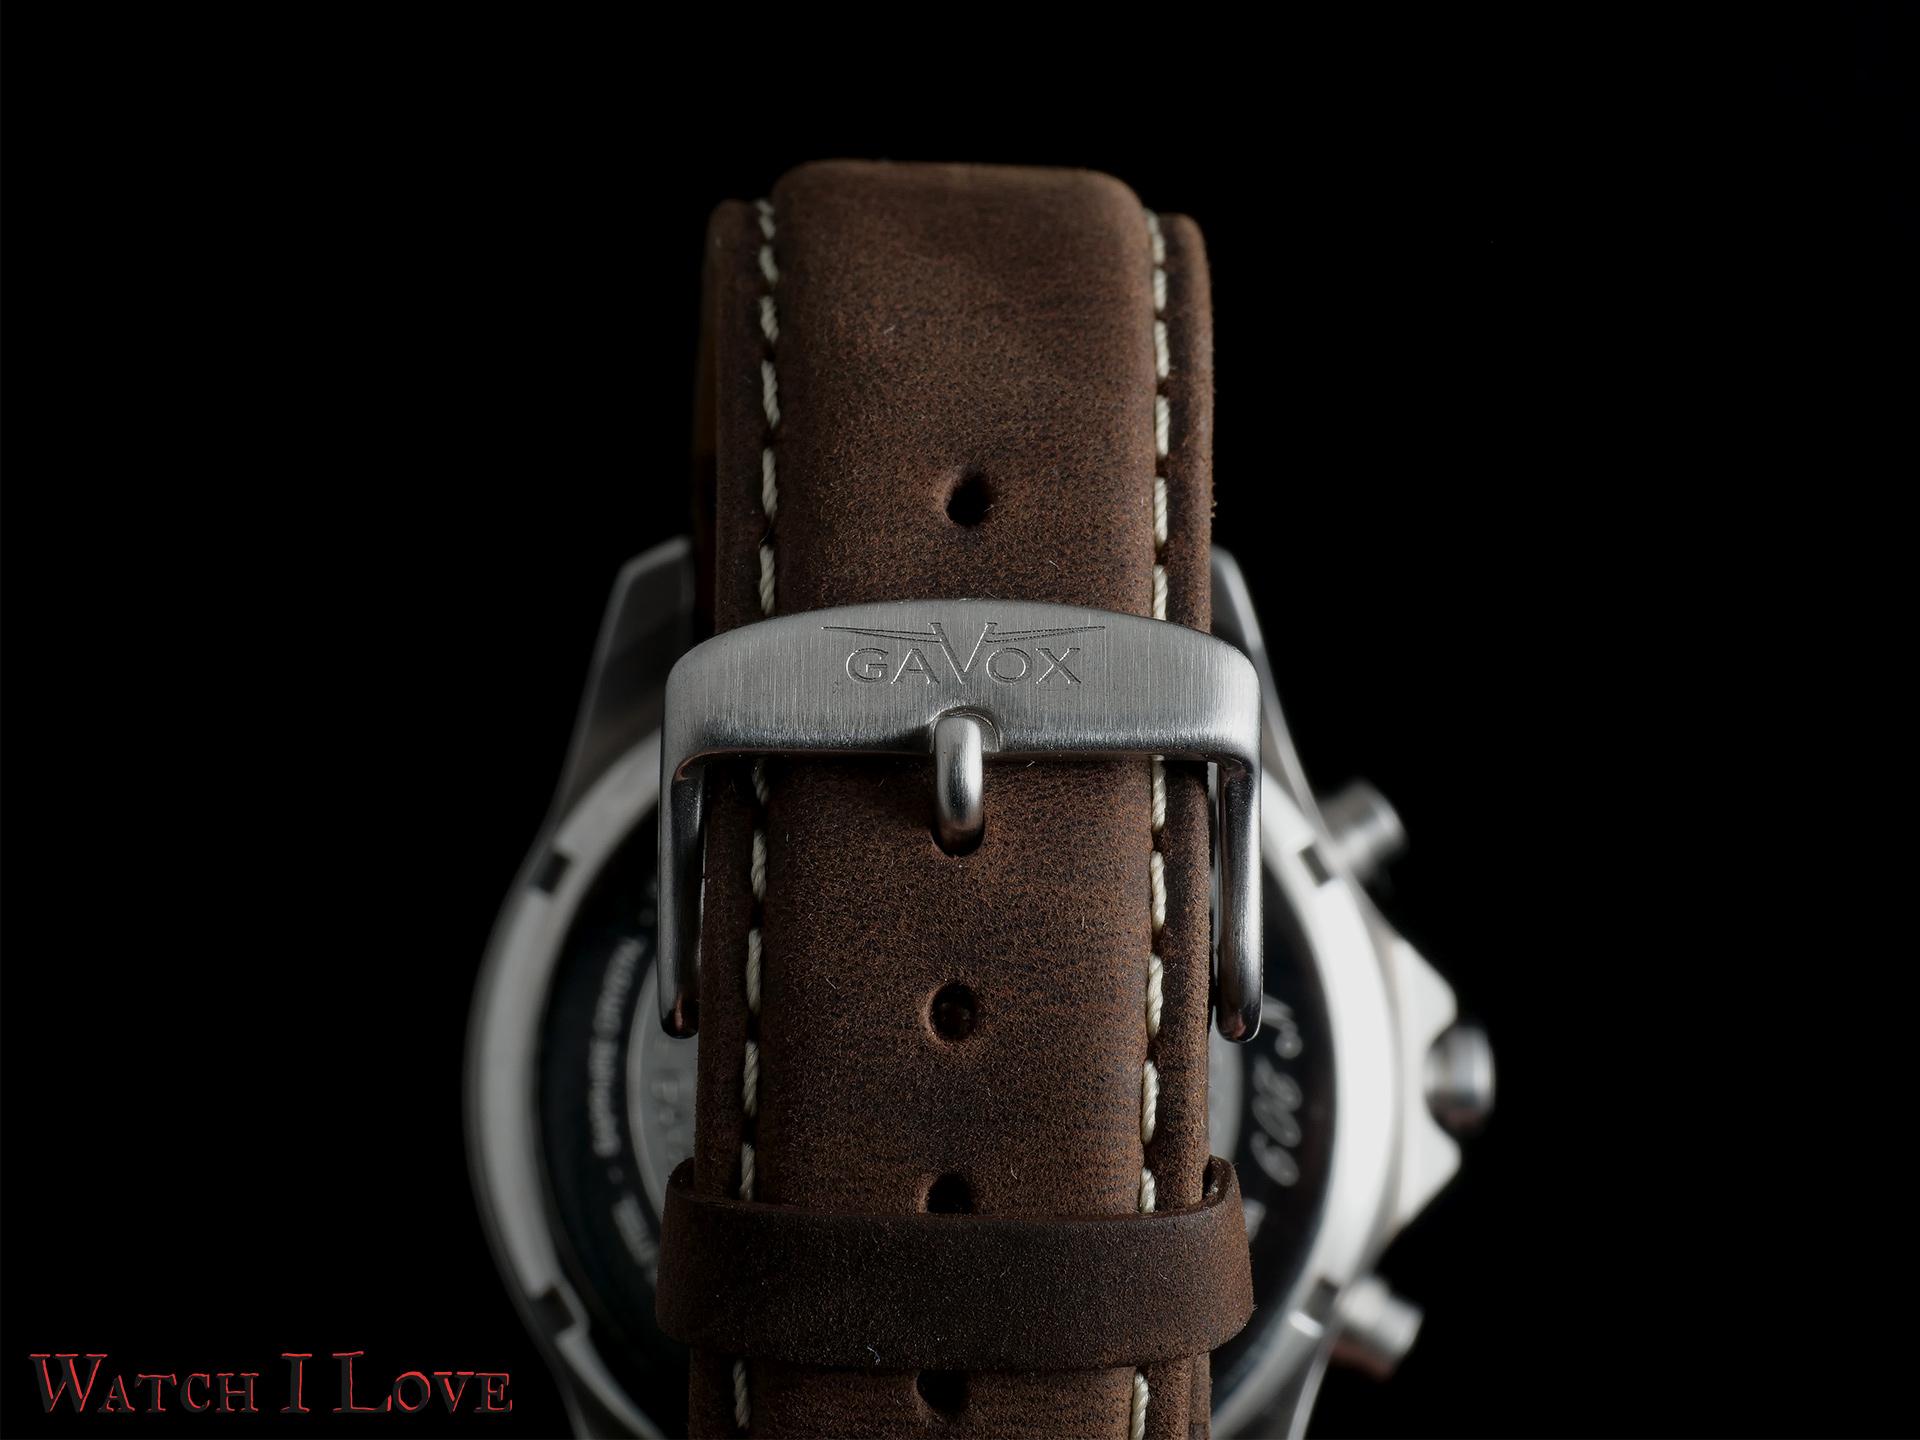 Gavox Aurora strap and buckle